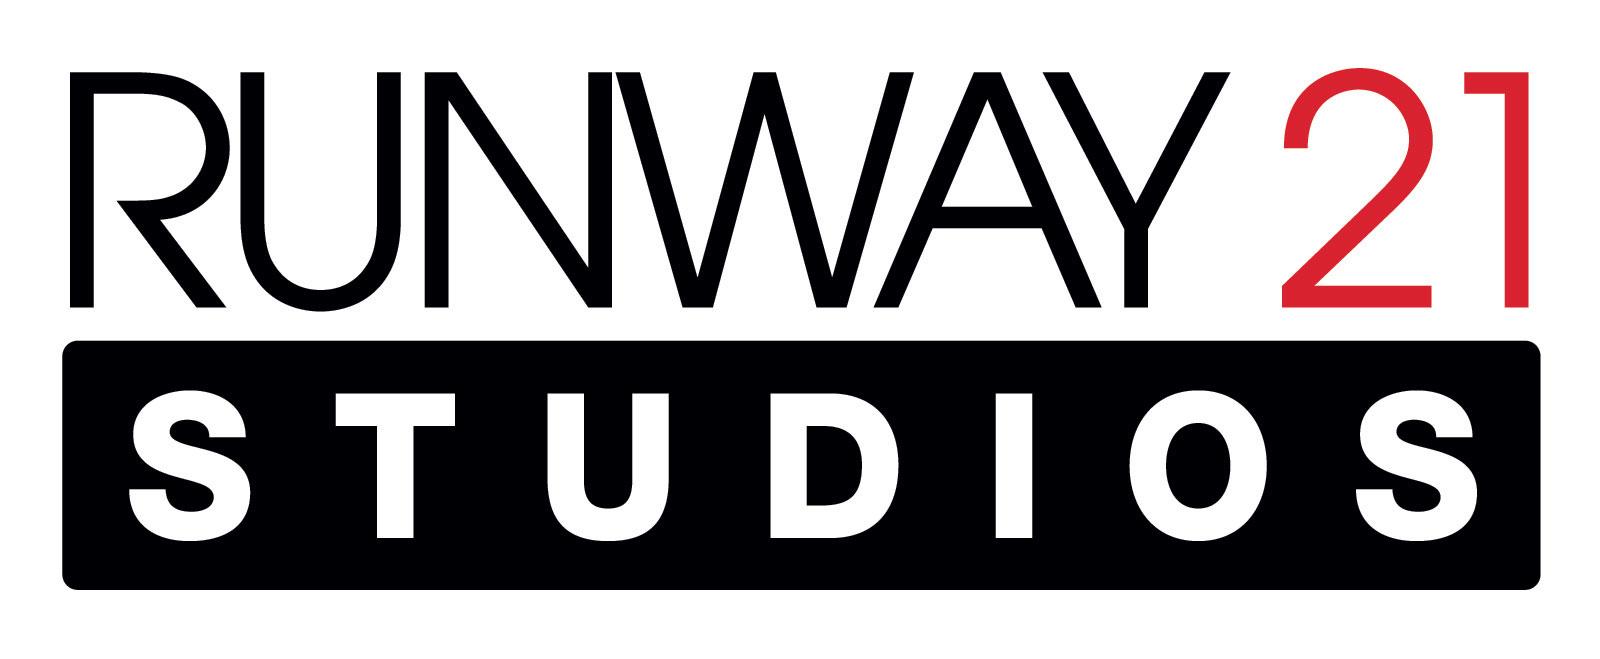 Runway 21 Studios